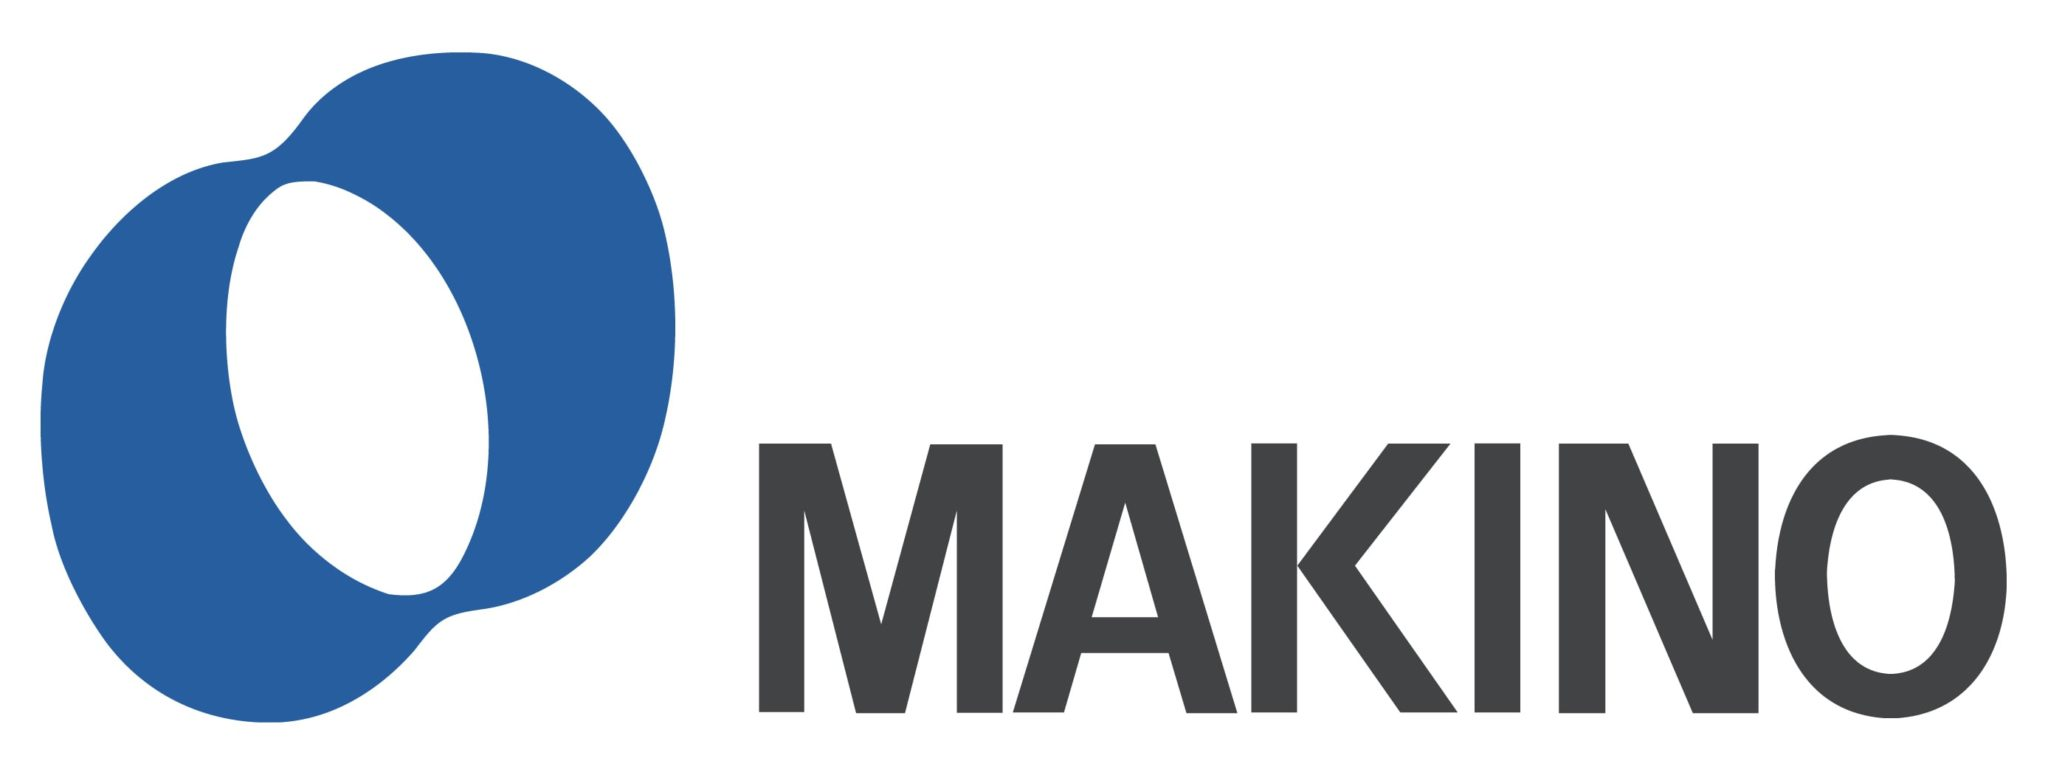 Makino/SST